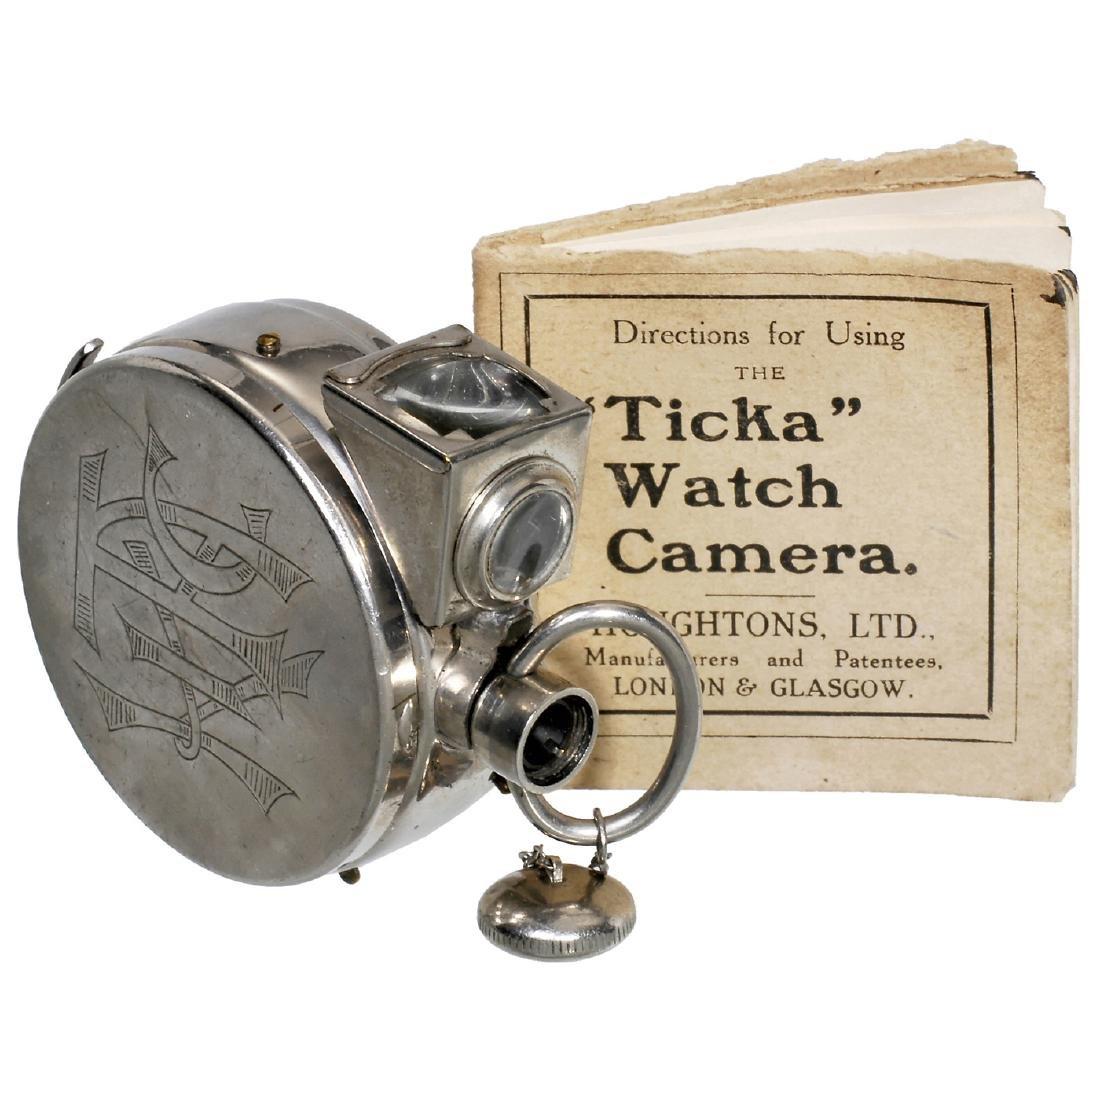 Ticka Watch Camera, 1905